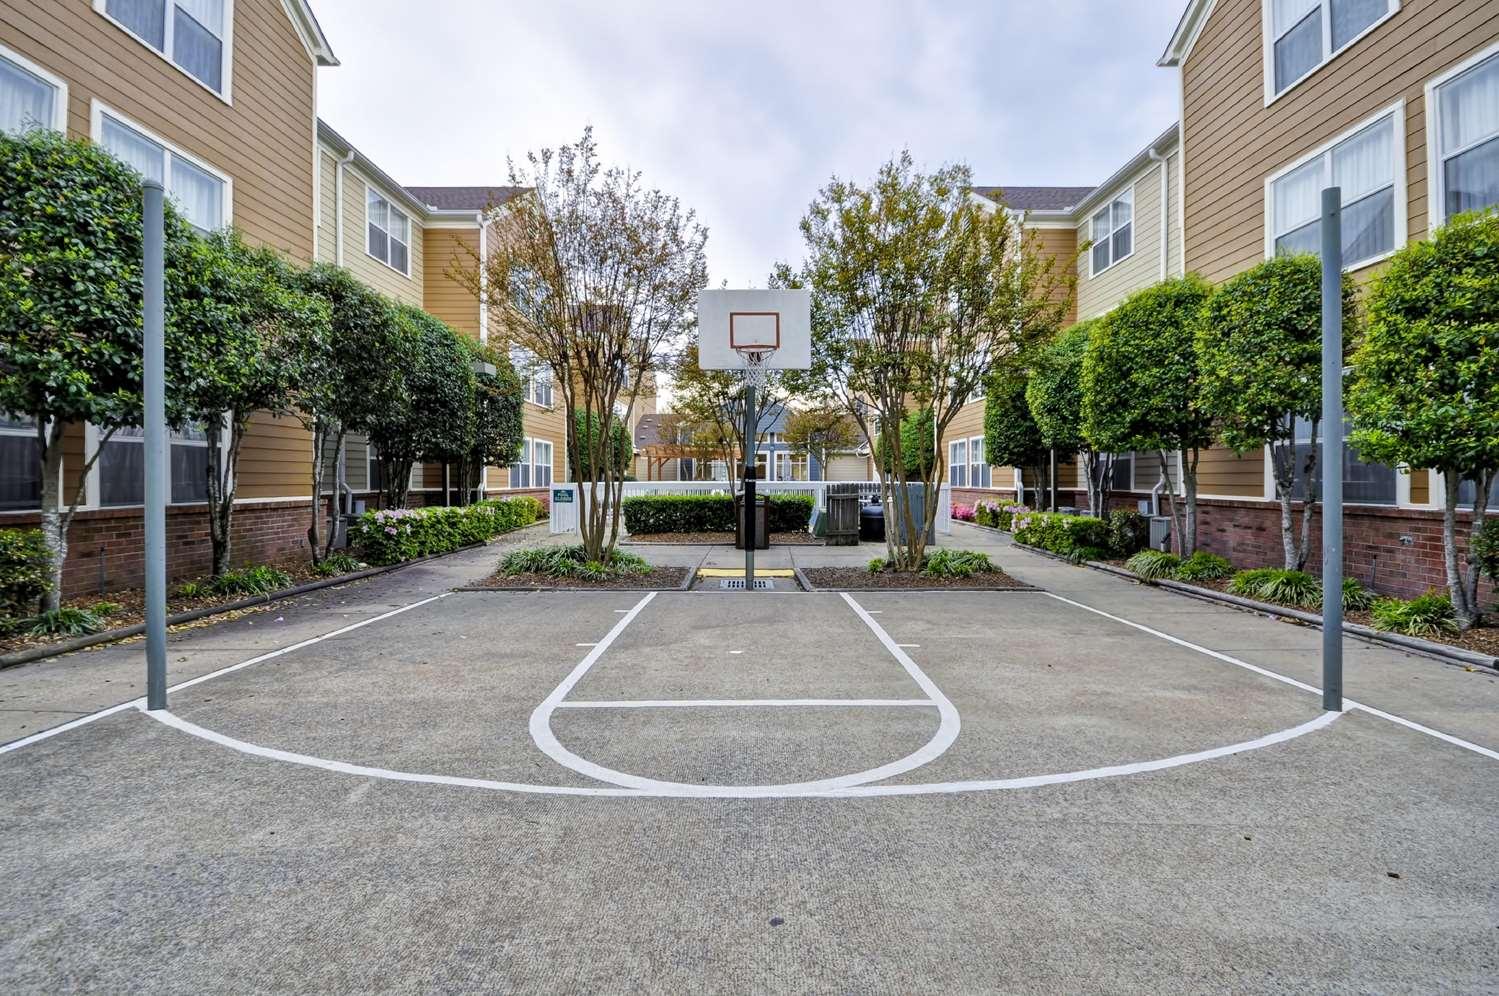 Recreation - Homewood Suites by Hilton Germantown